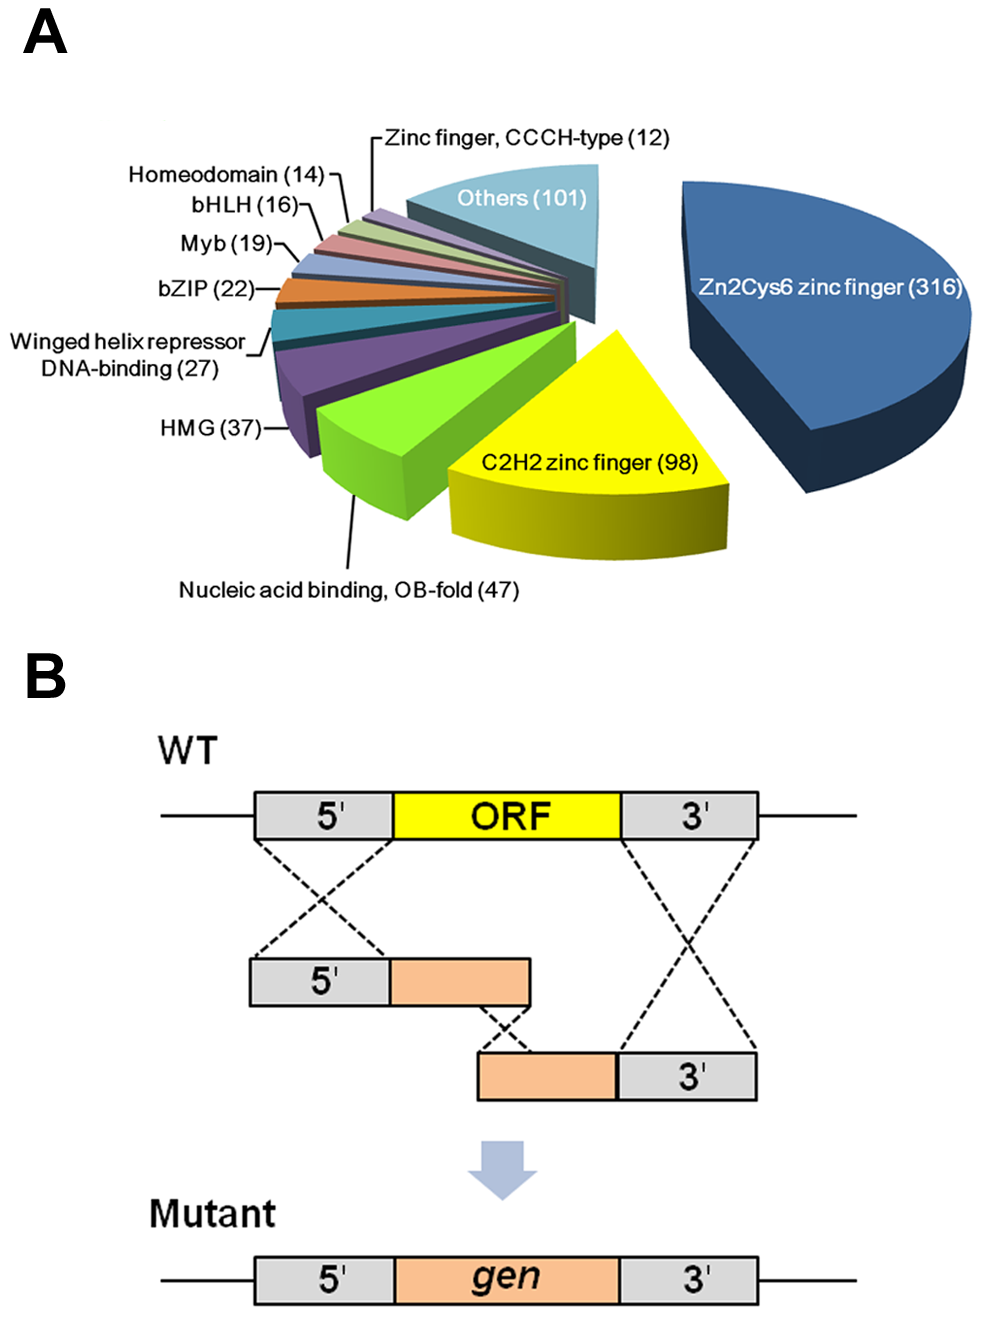 Classification and deletion strategy of putative transcription factors (TFs) in <i>Fusarium graminearum</i>.